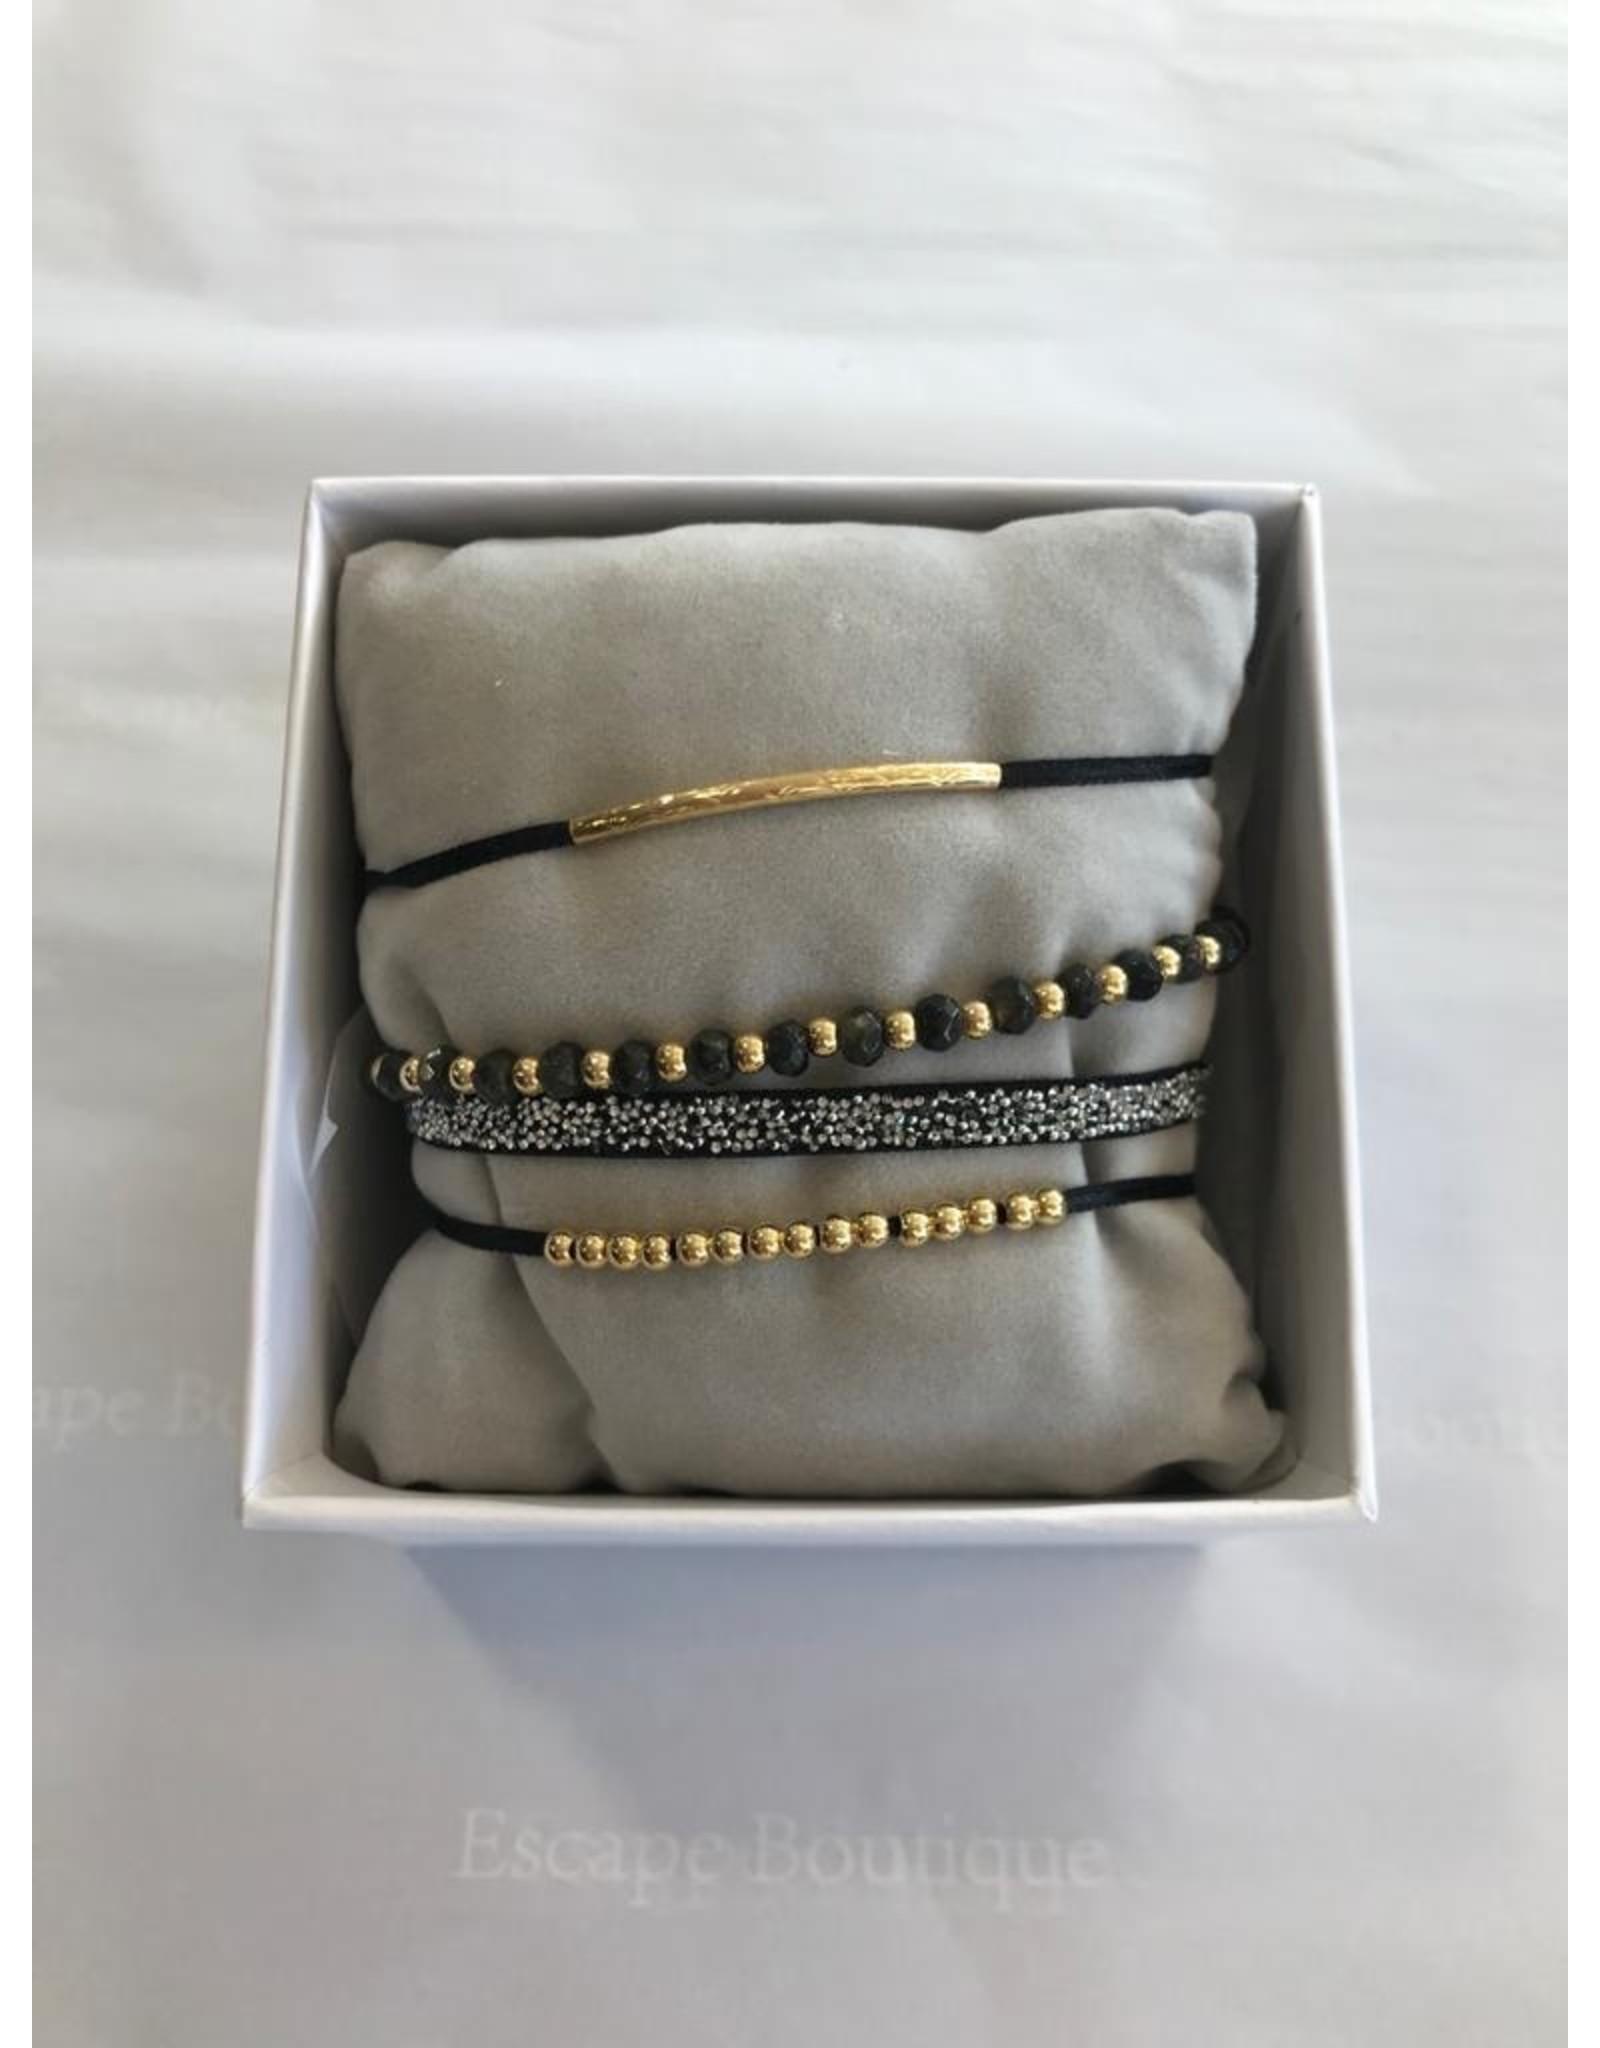 Les Interchangeables Strass Box Malicieuse 4 Bracelets Gold